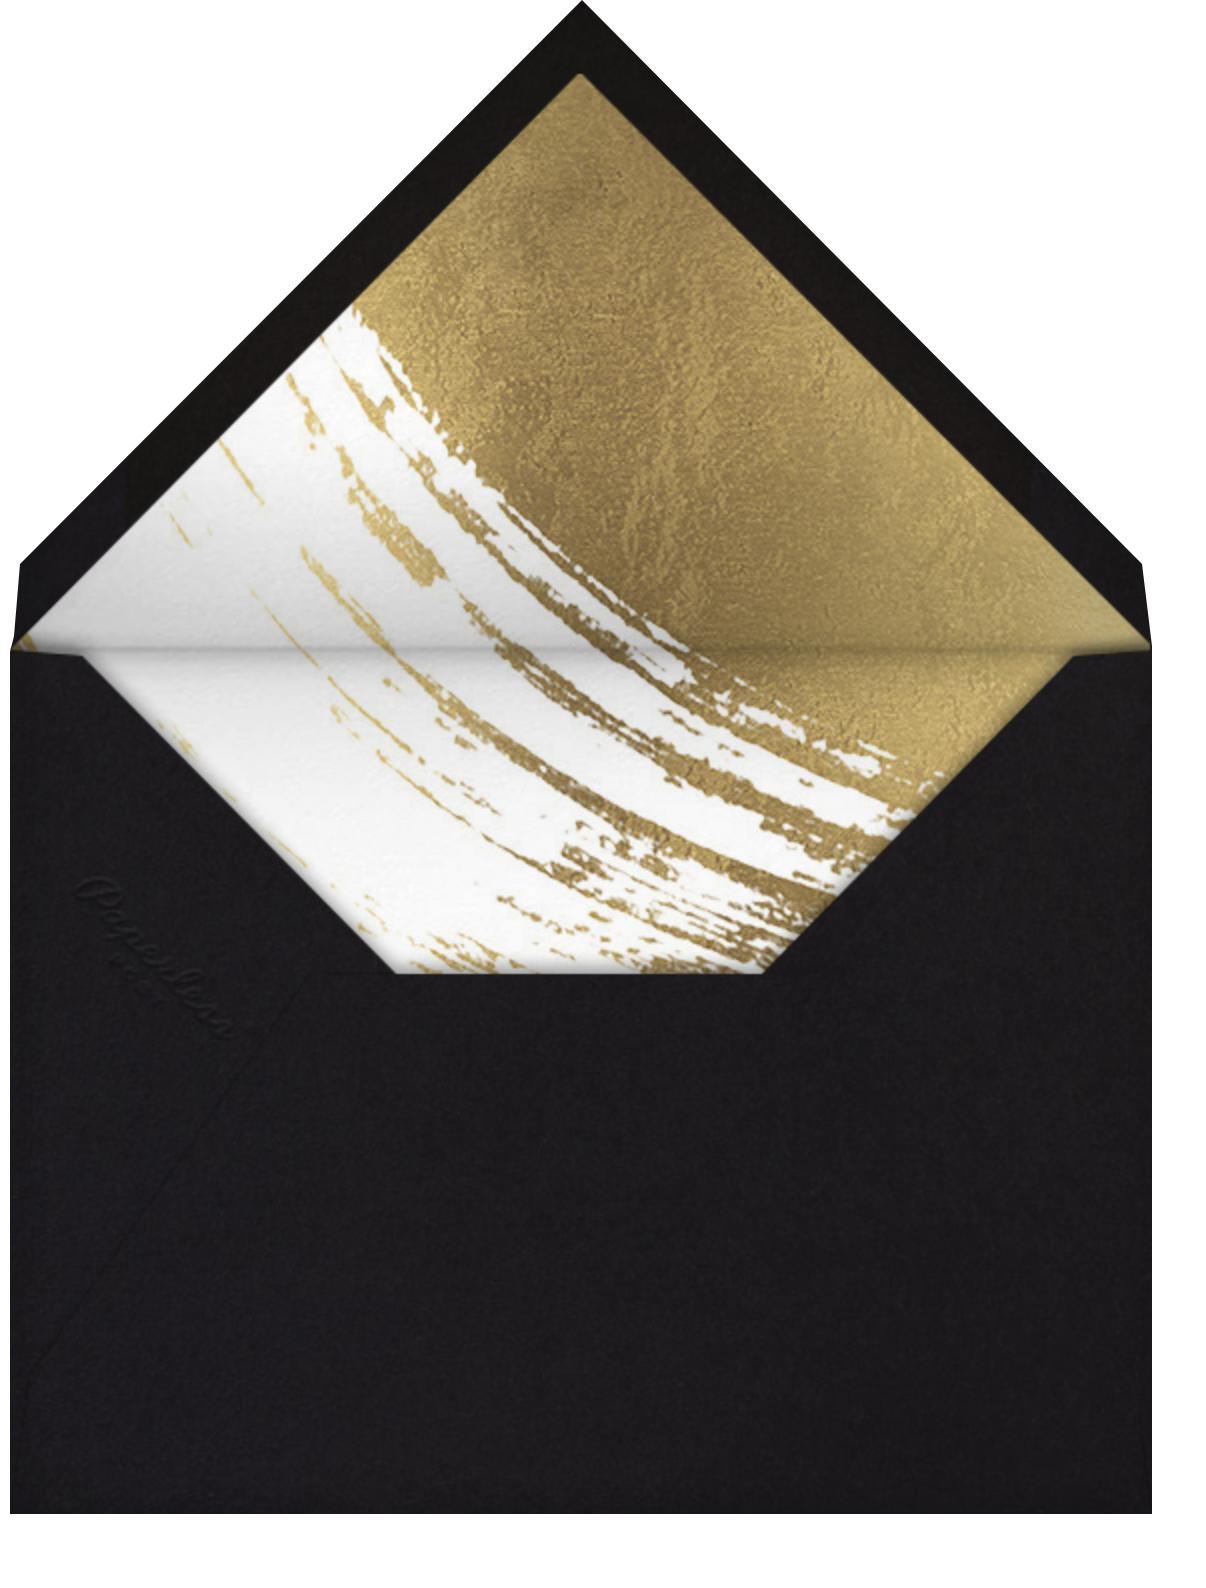 Impasto - Paperless Post - New Year's Eve - envelope back